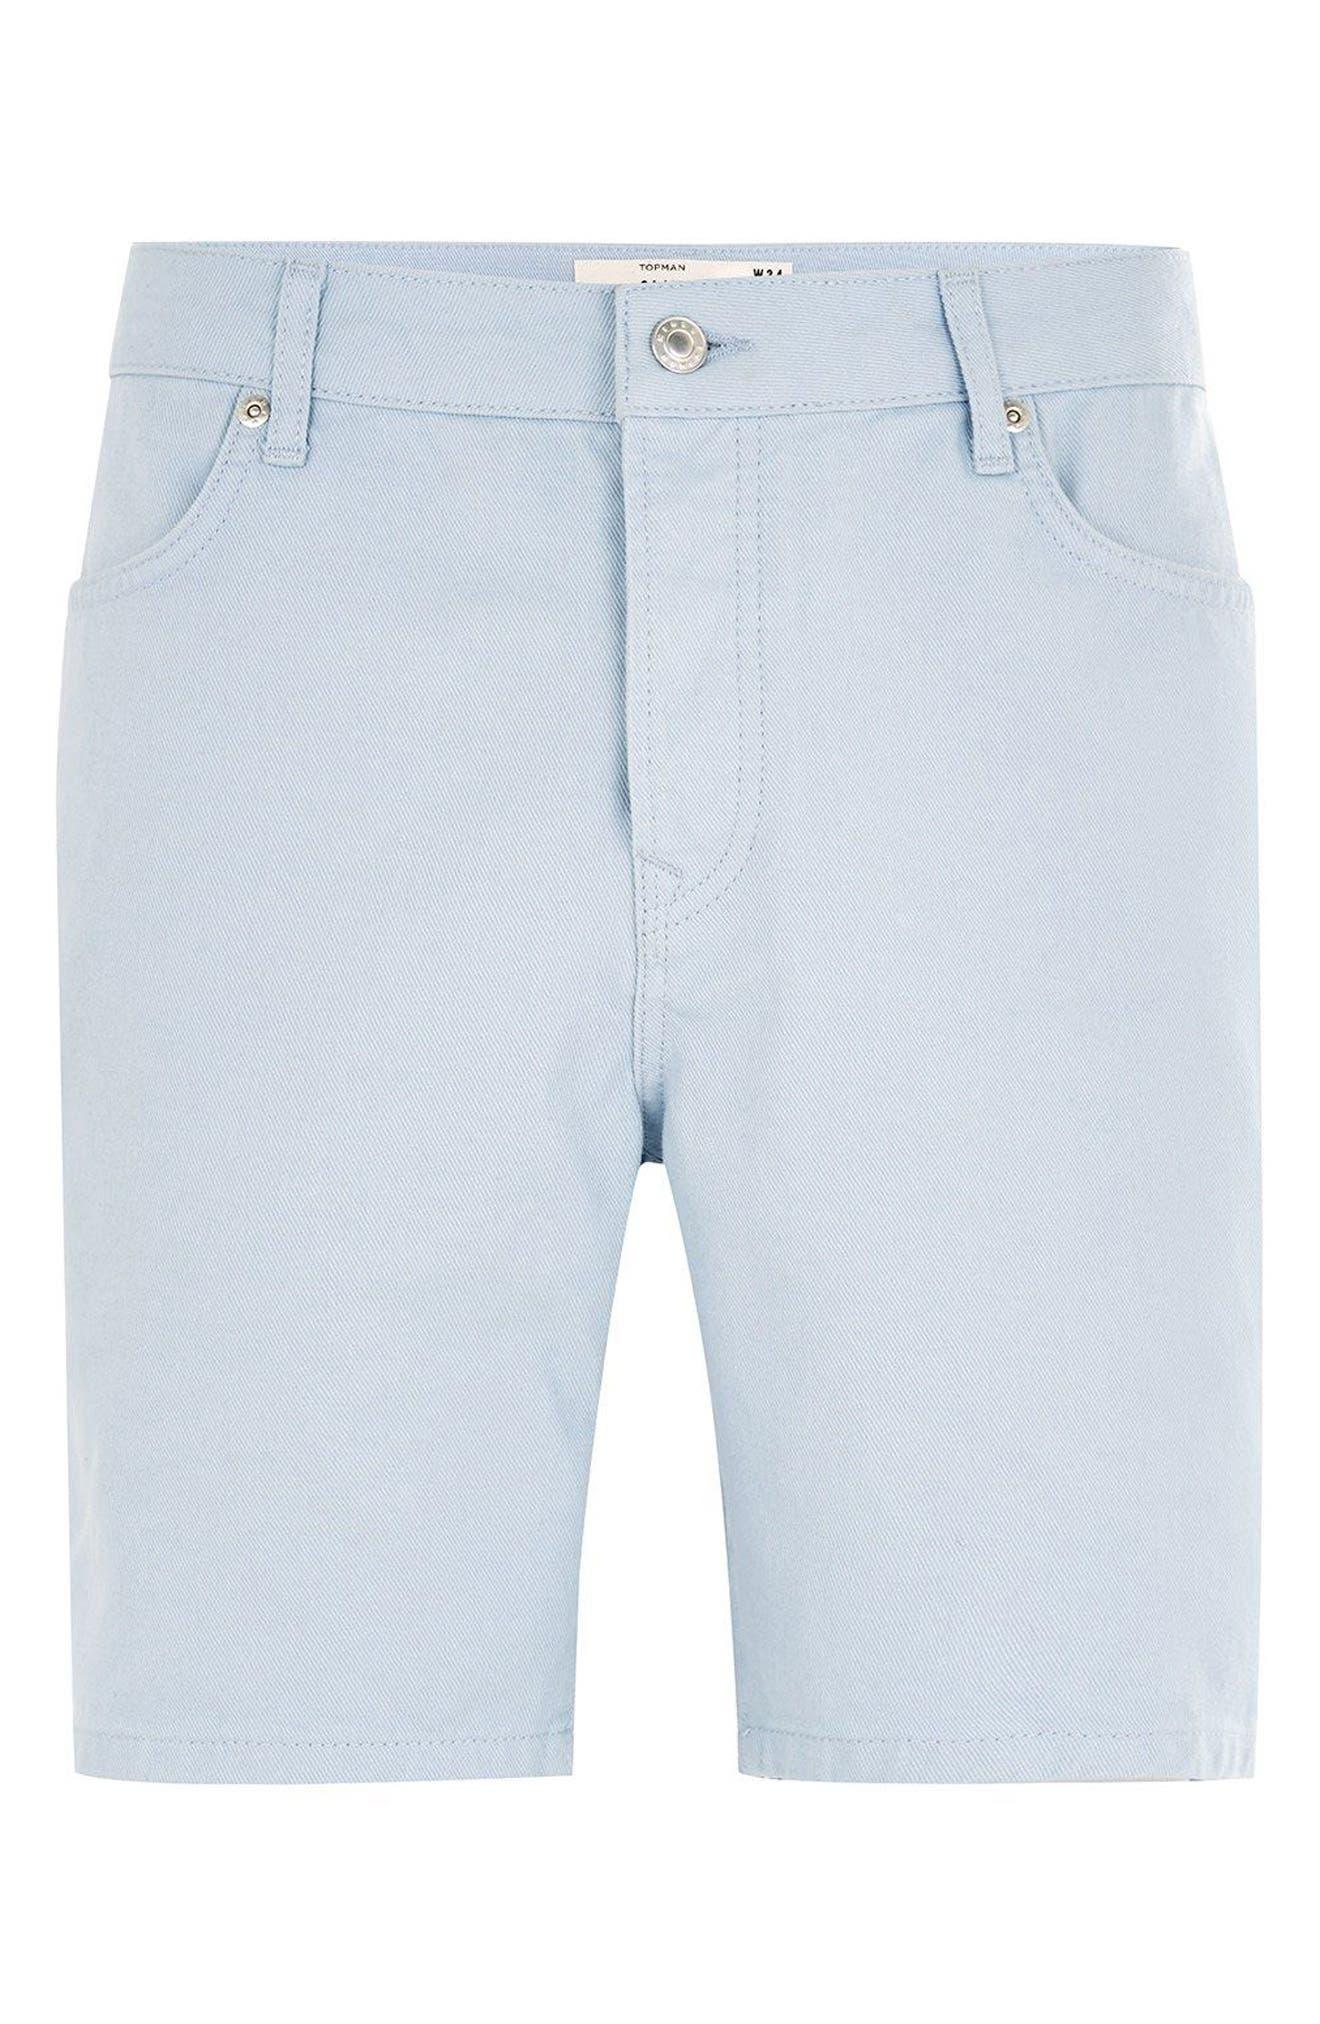 Slim Fit Denim Shorts,                             Alternate thumbnail 4, color,                             400